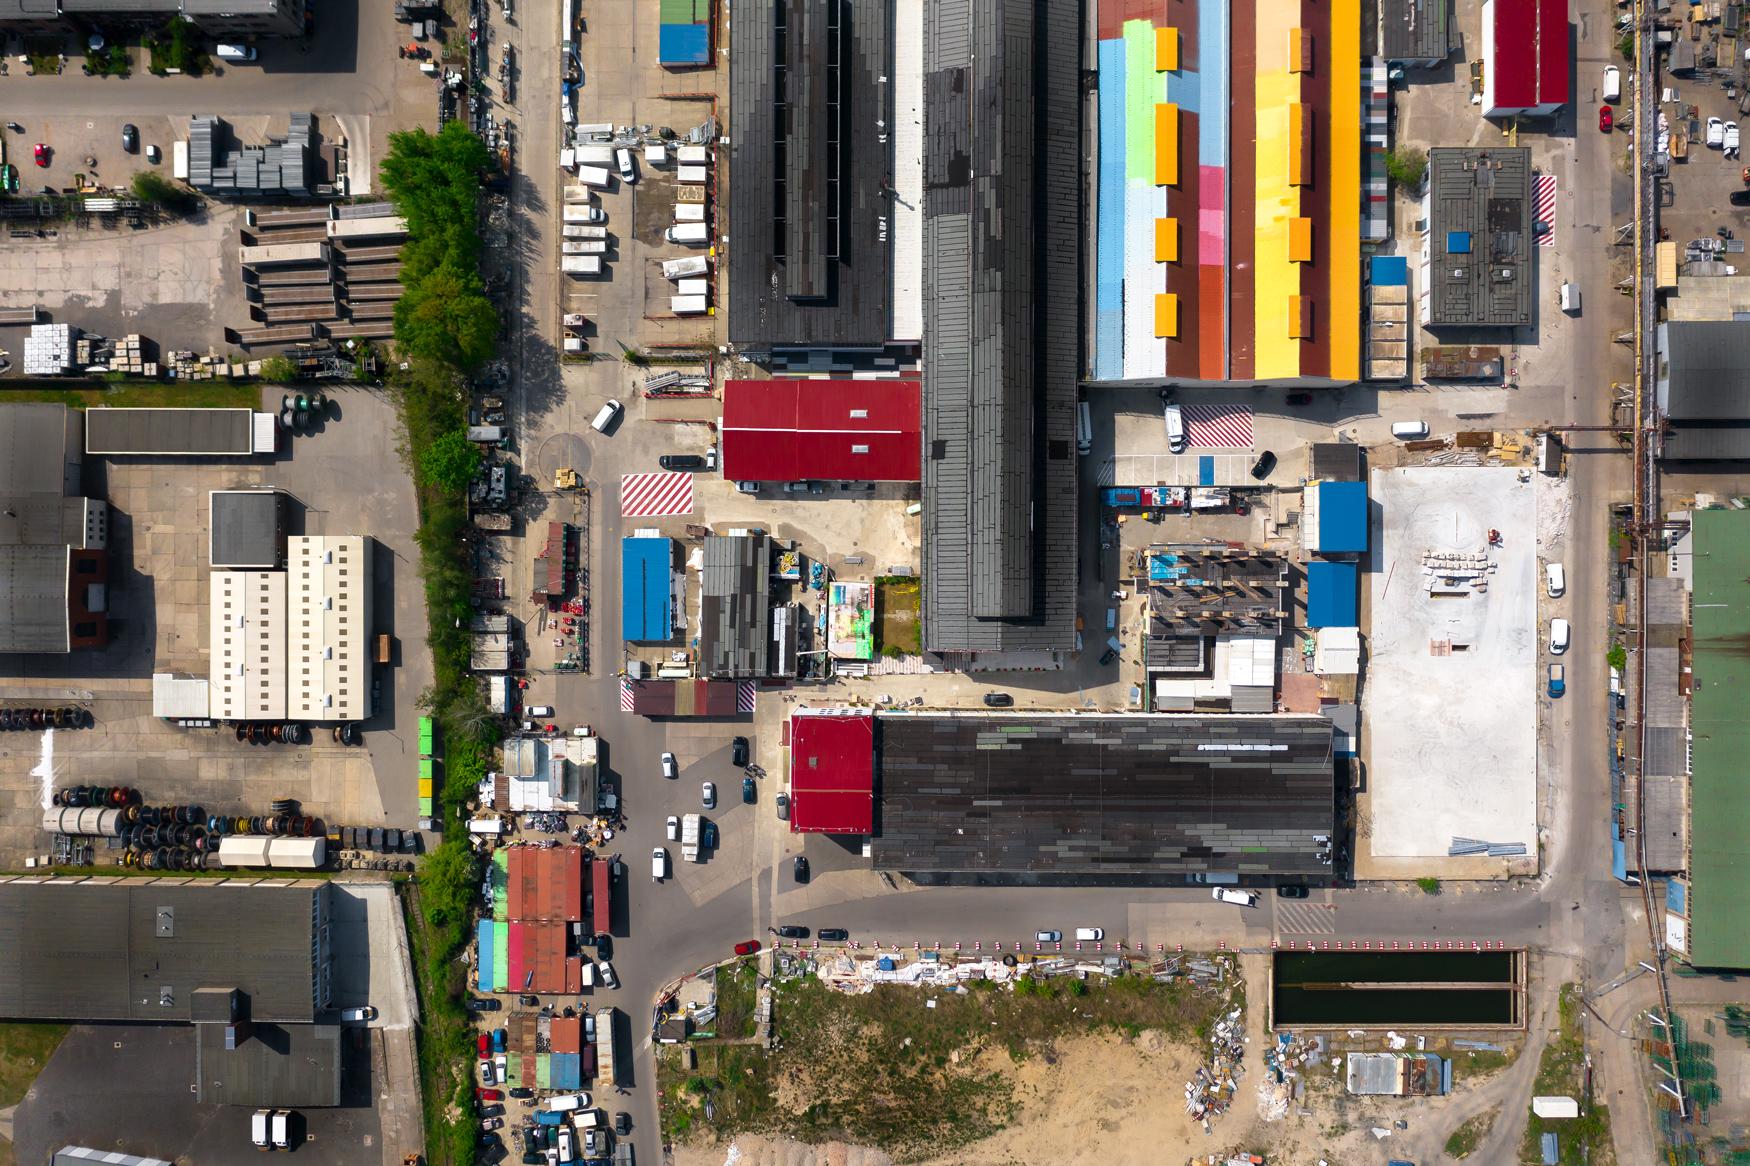 Luftbildaufnahmen-Berlin-Marco-van-oel